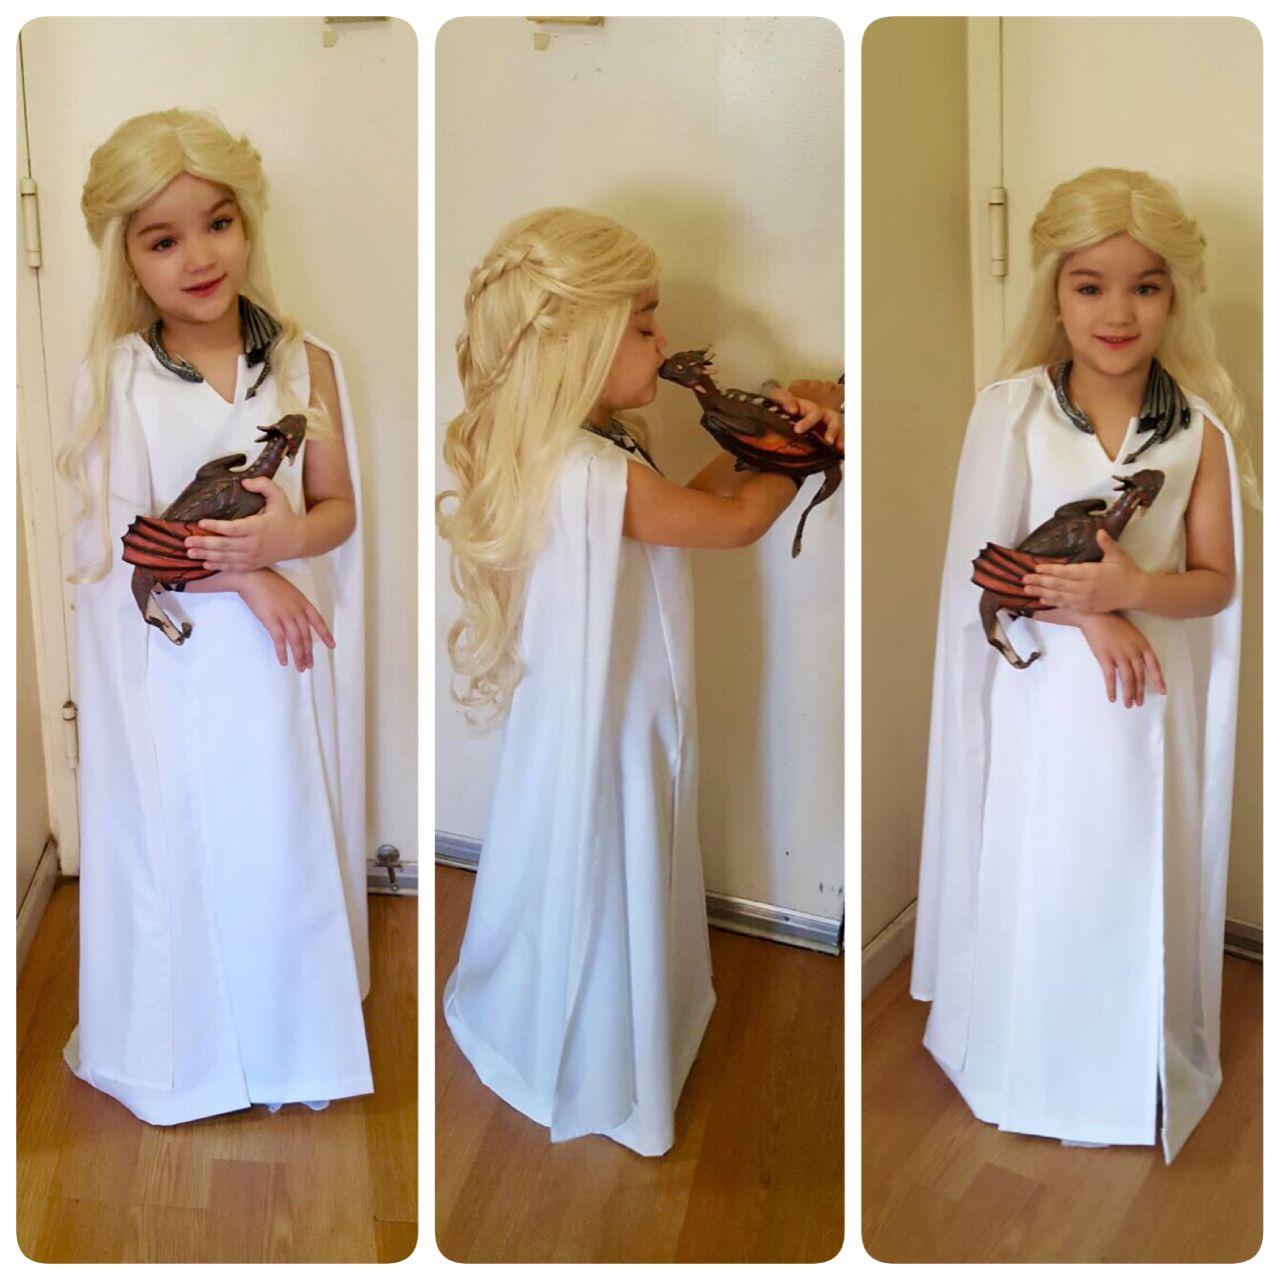 Game of thrones kids costume daenerys targaryen stormborn for Game of thrones daenerys costume diy